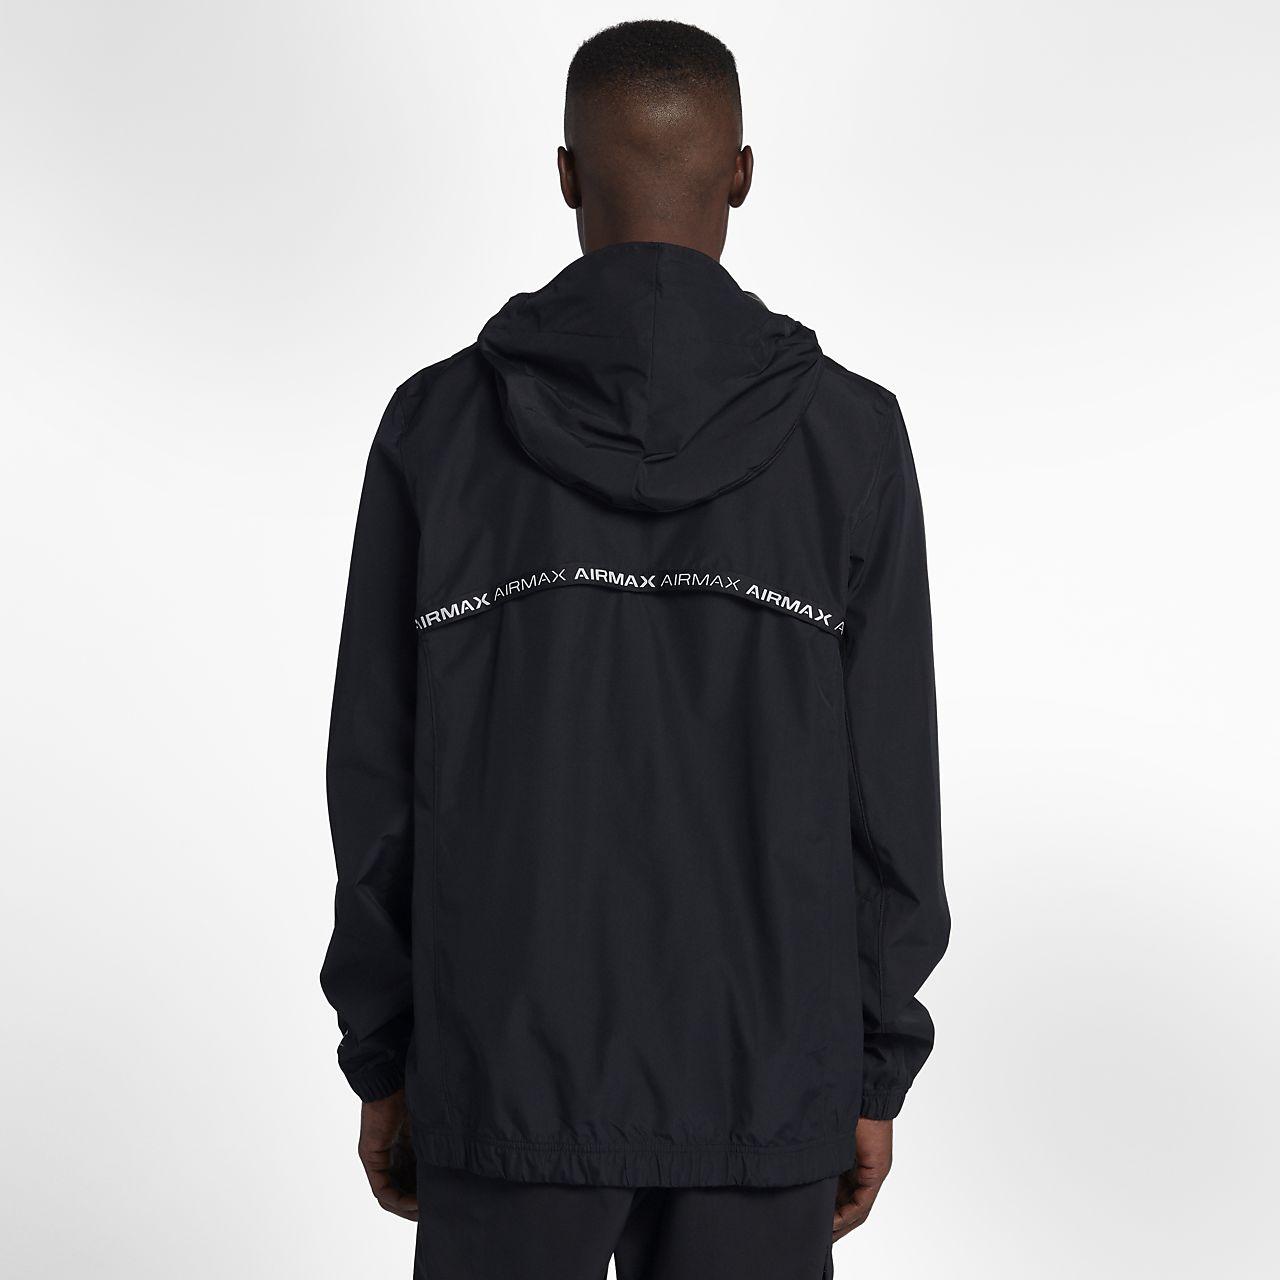 low priced 191e1 f2e76 ... Nike Sportswear Air Max Men s Reversible Jacket